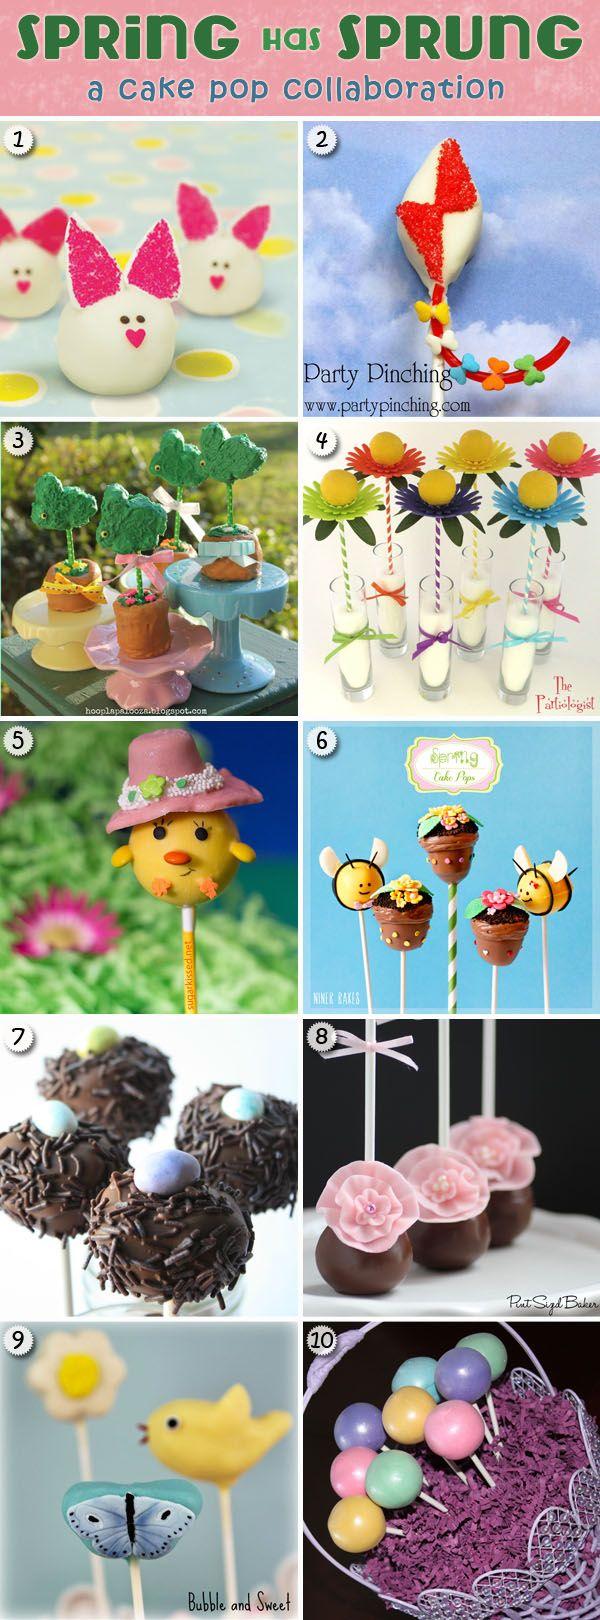 Bunny Cake Bites & Spring Cake Pop Collaboration